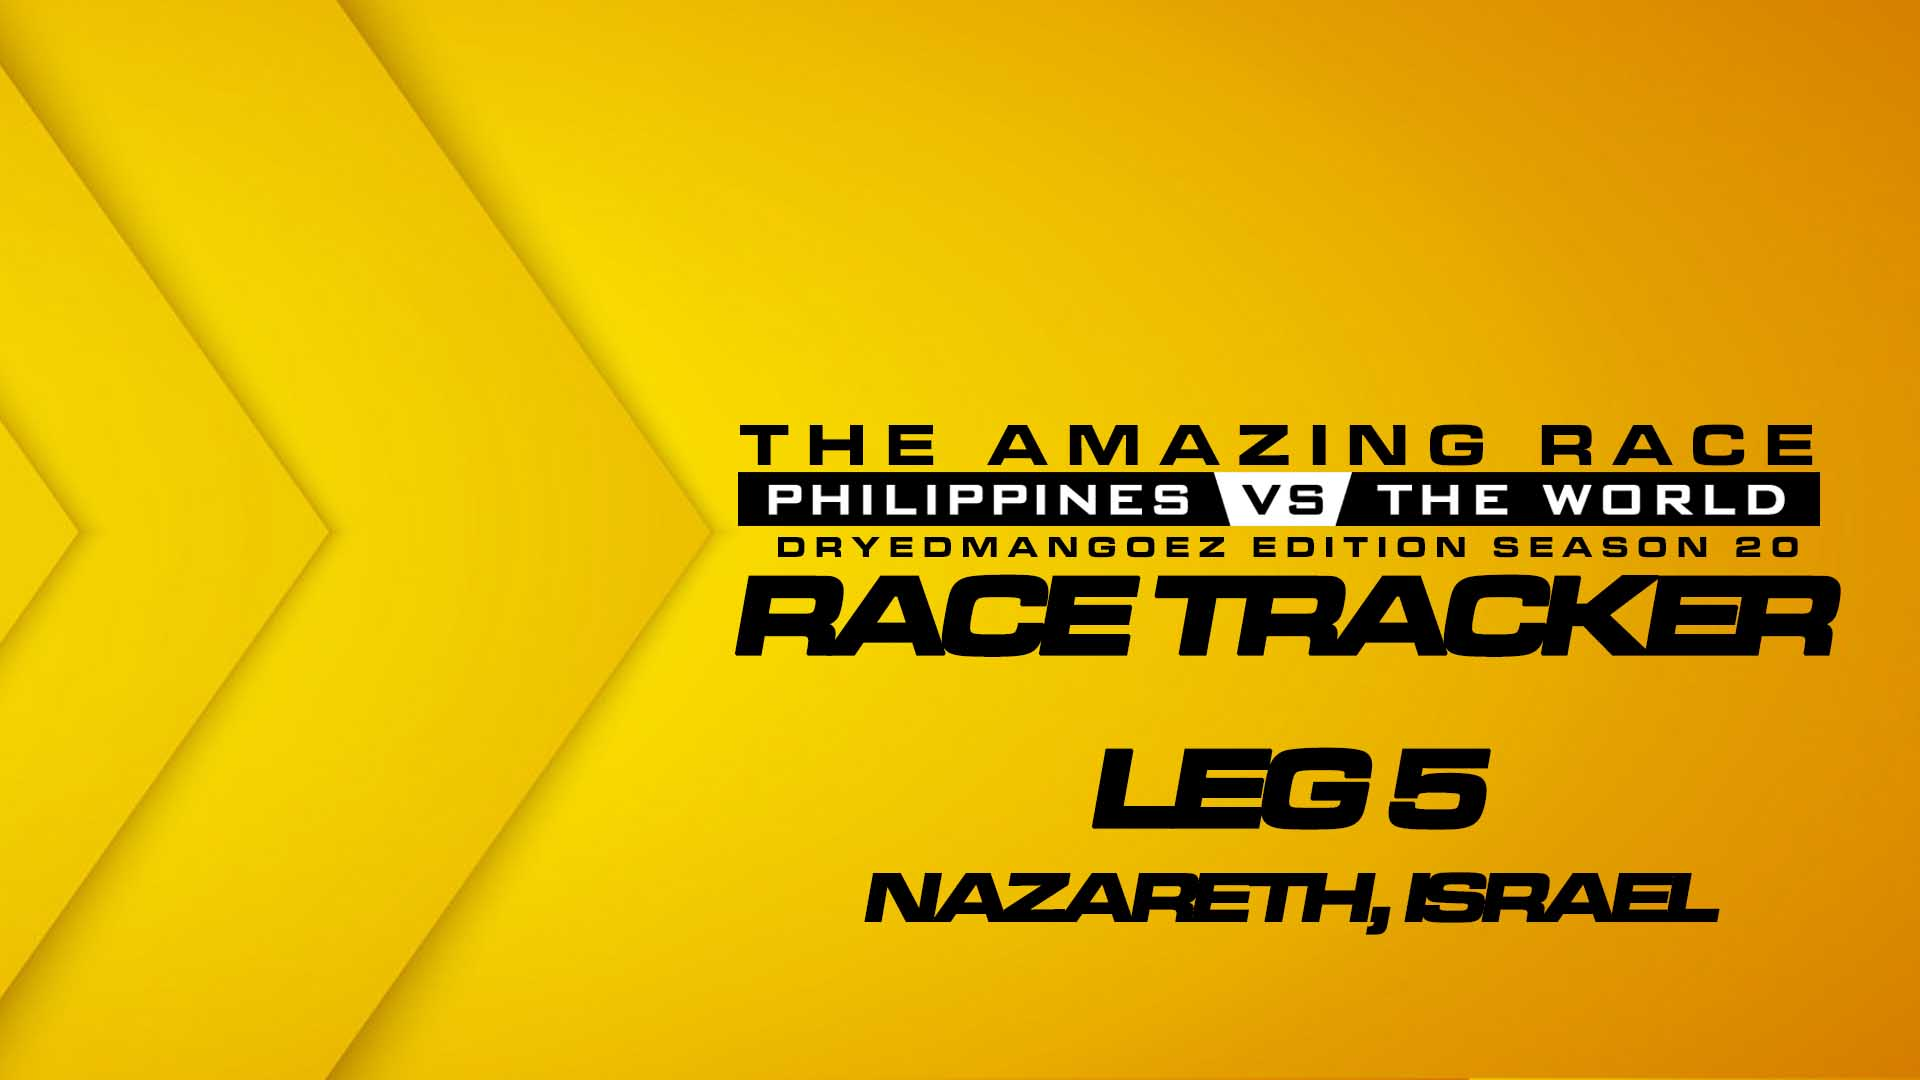 The Amazing Race Philippines vs The World (DryedMangoez Edition Season 20) Race Tracker – Leg 5